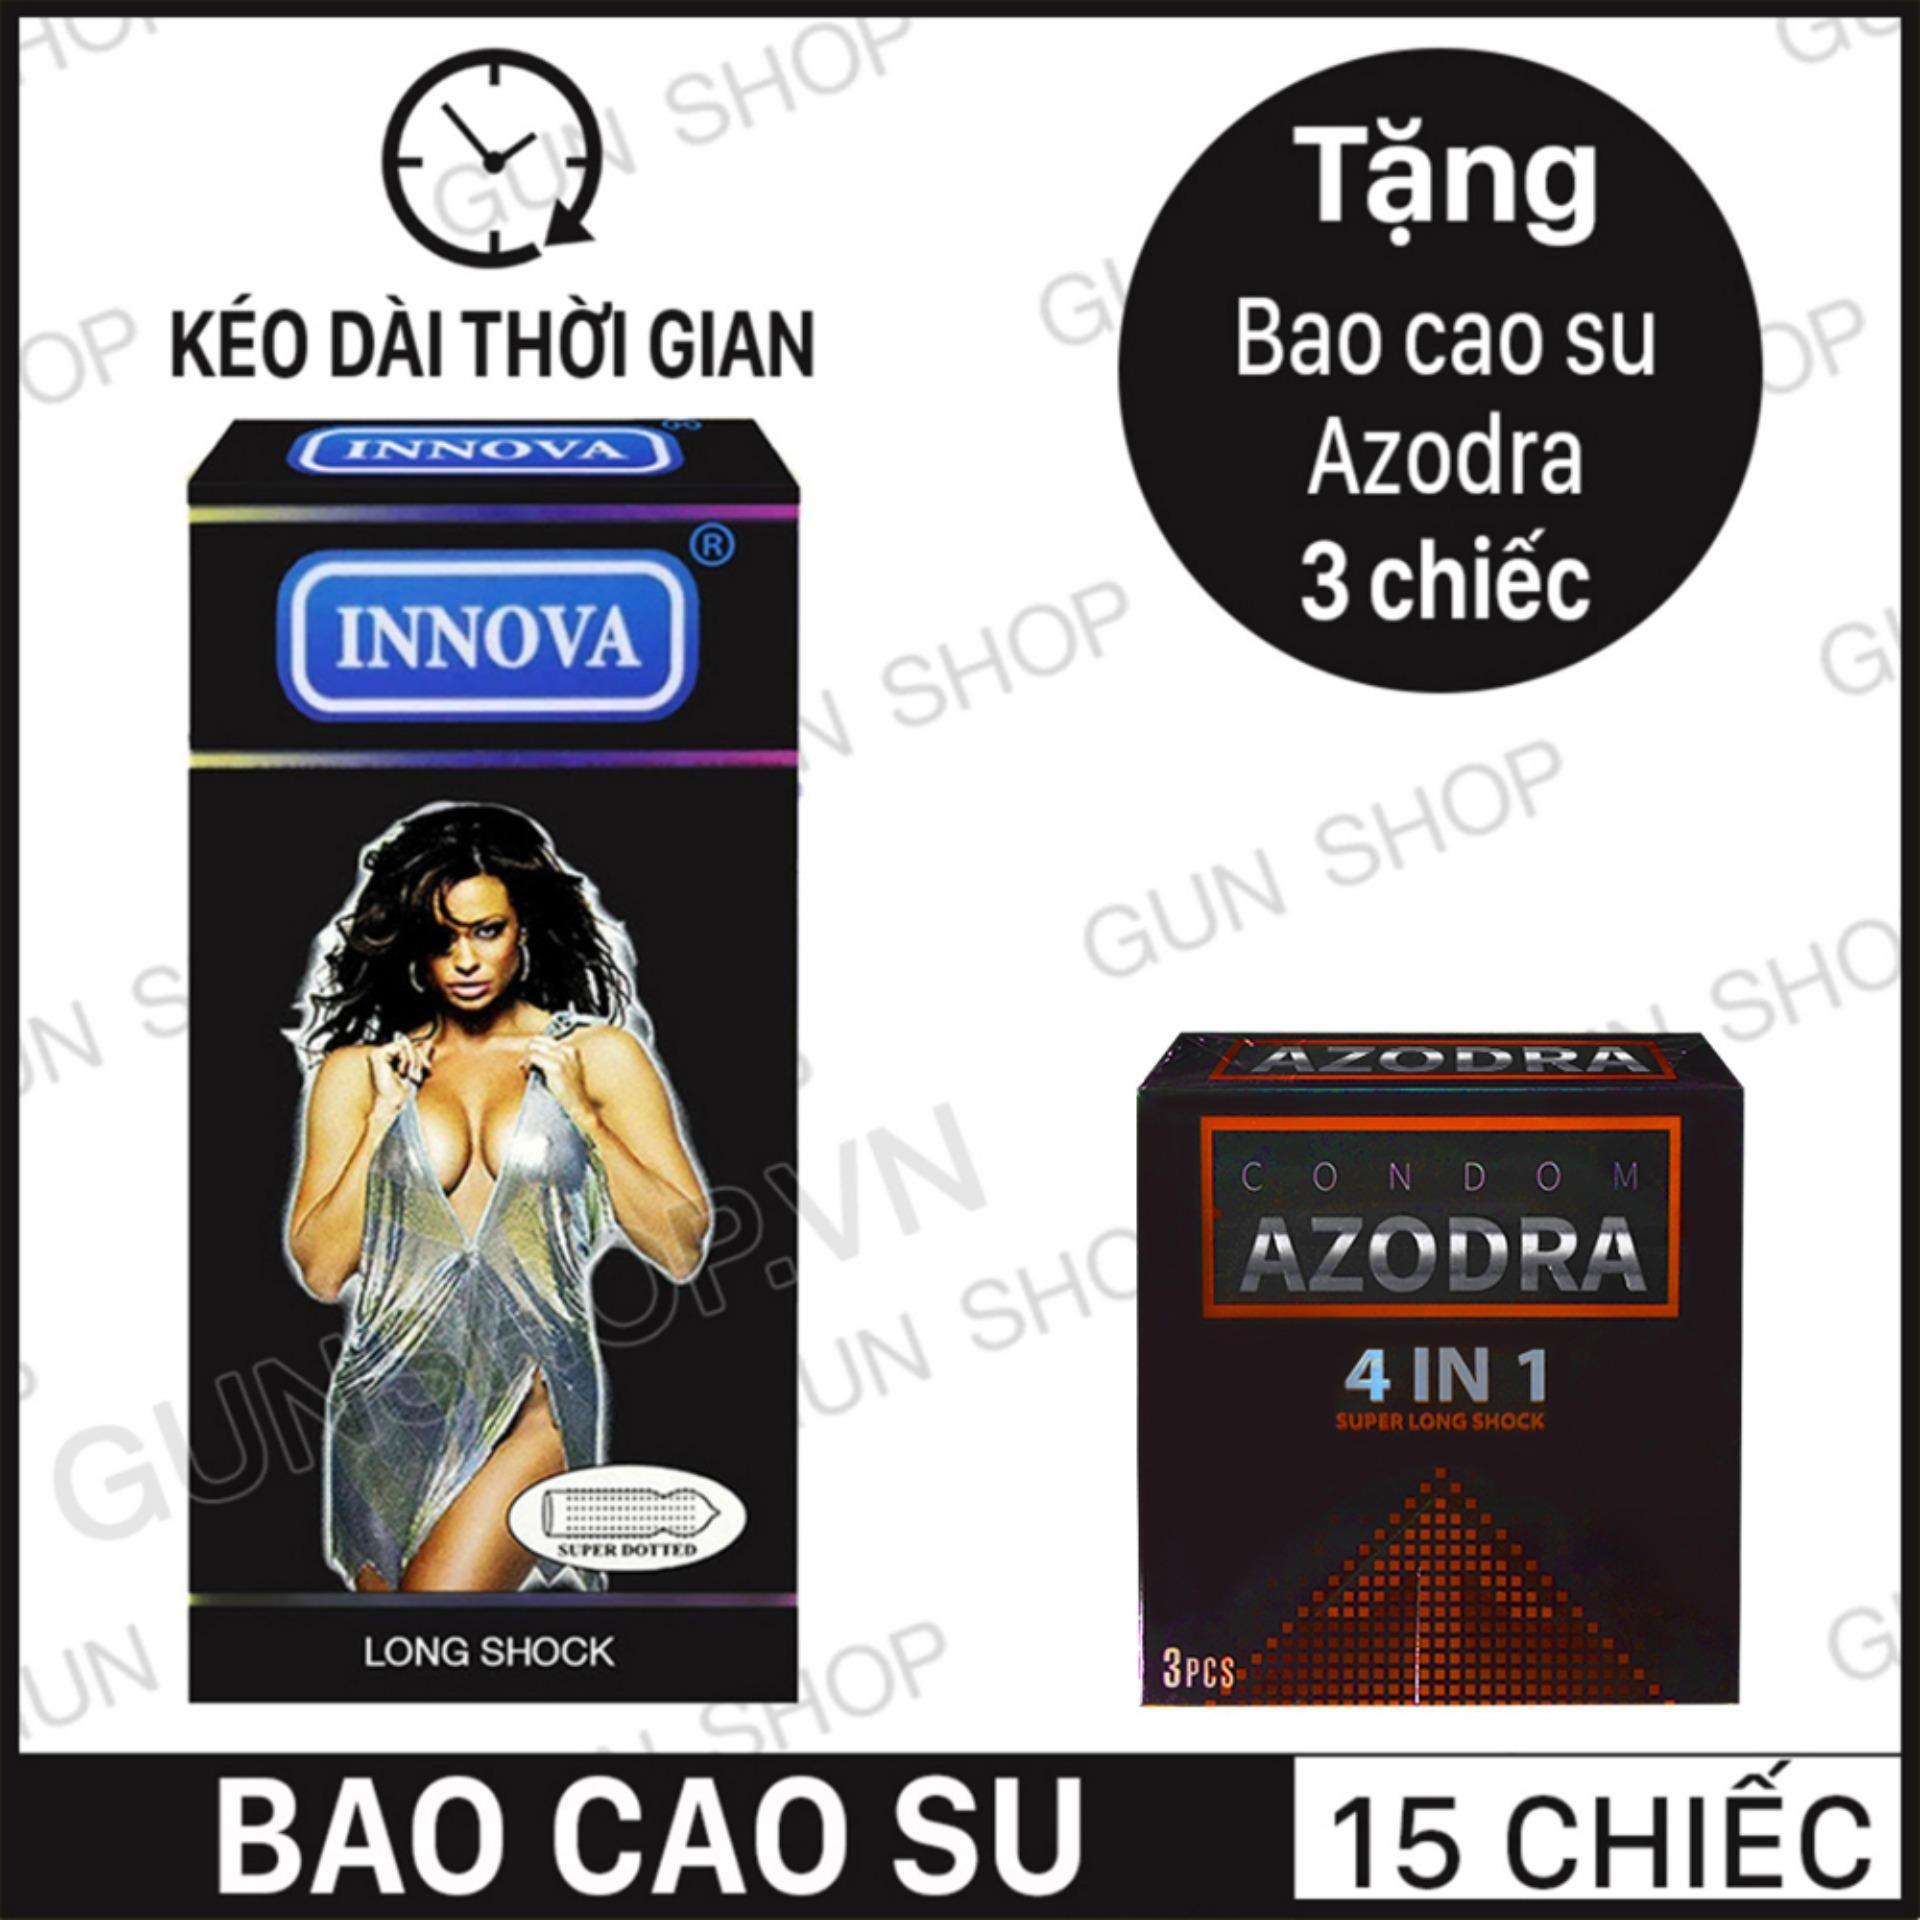 Hình ảnh Bao Cao Su INNOVA Đen (Hộp 12 chiếc) + Tặng 1 Bao Cao Su Azodra (Hộp 3 chiếc) (Malaisia) - [ Gunshop-BCS04 ] (CT01)